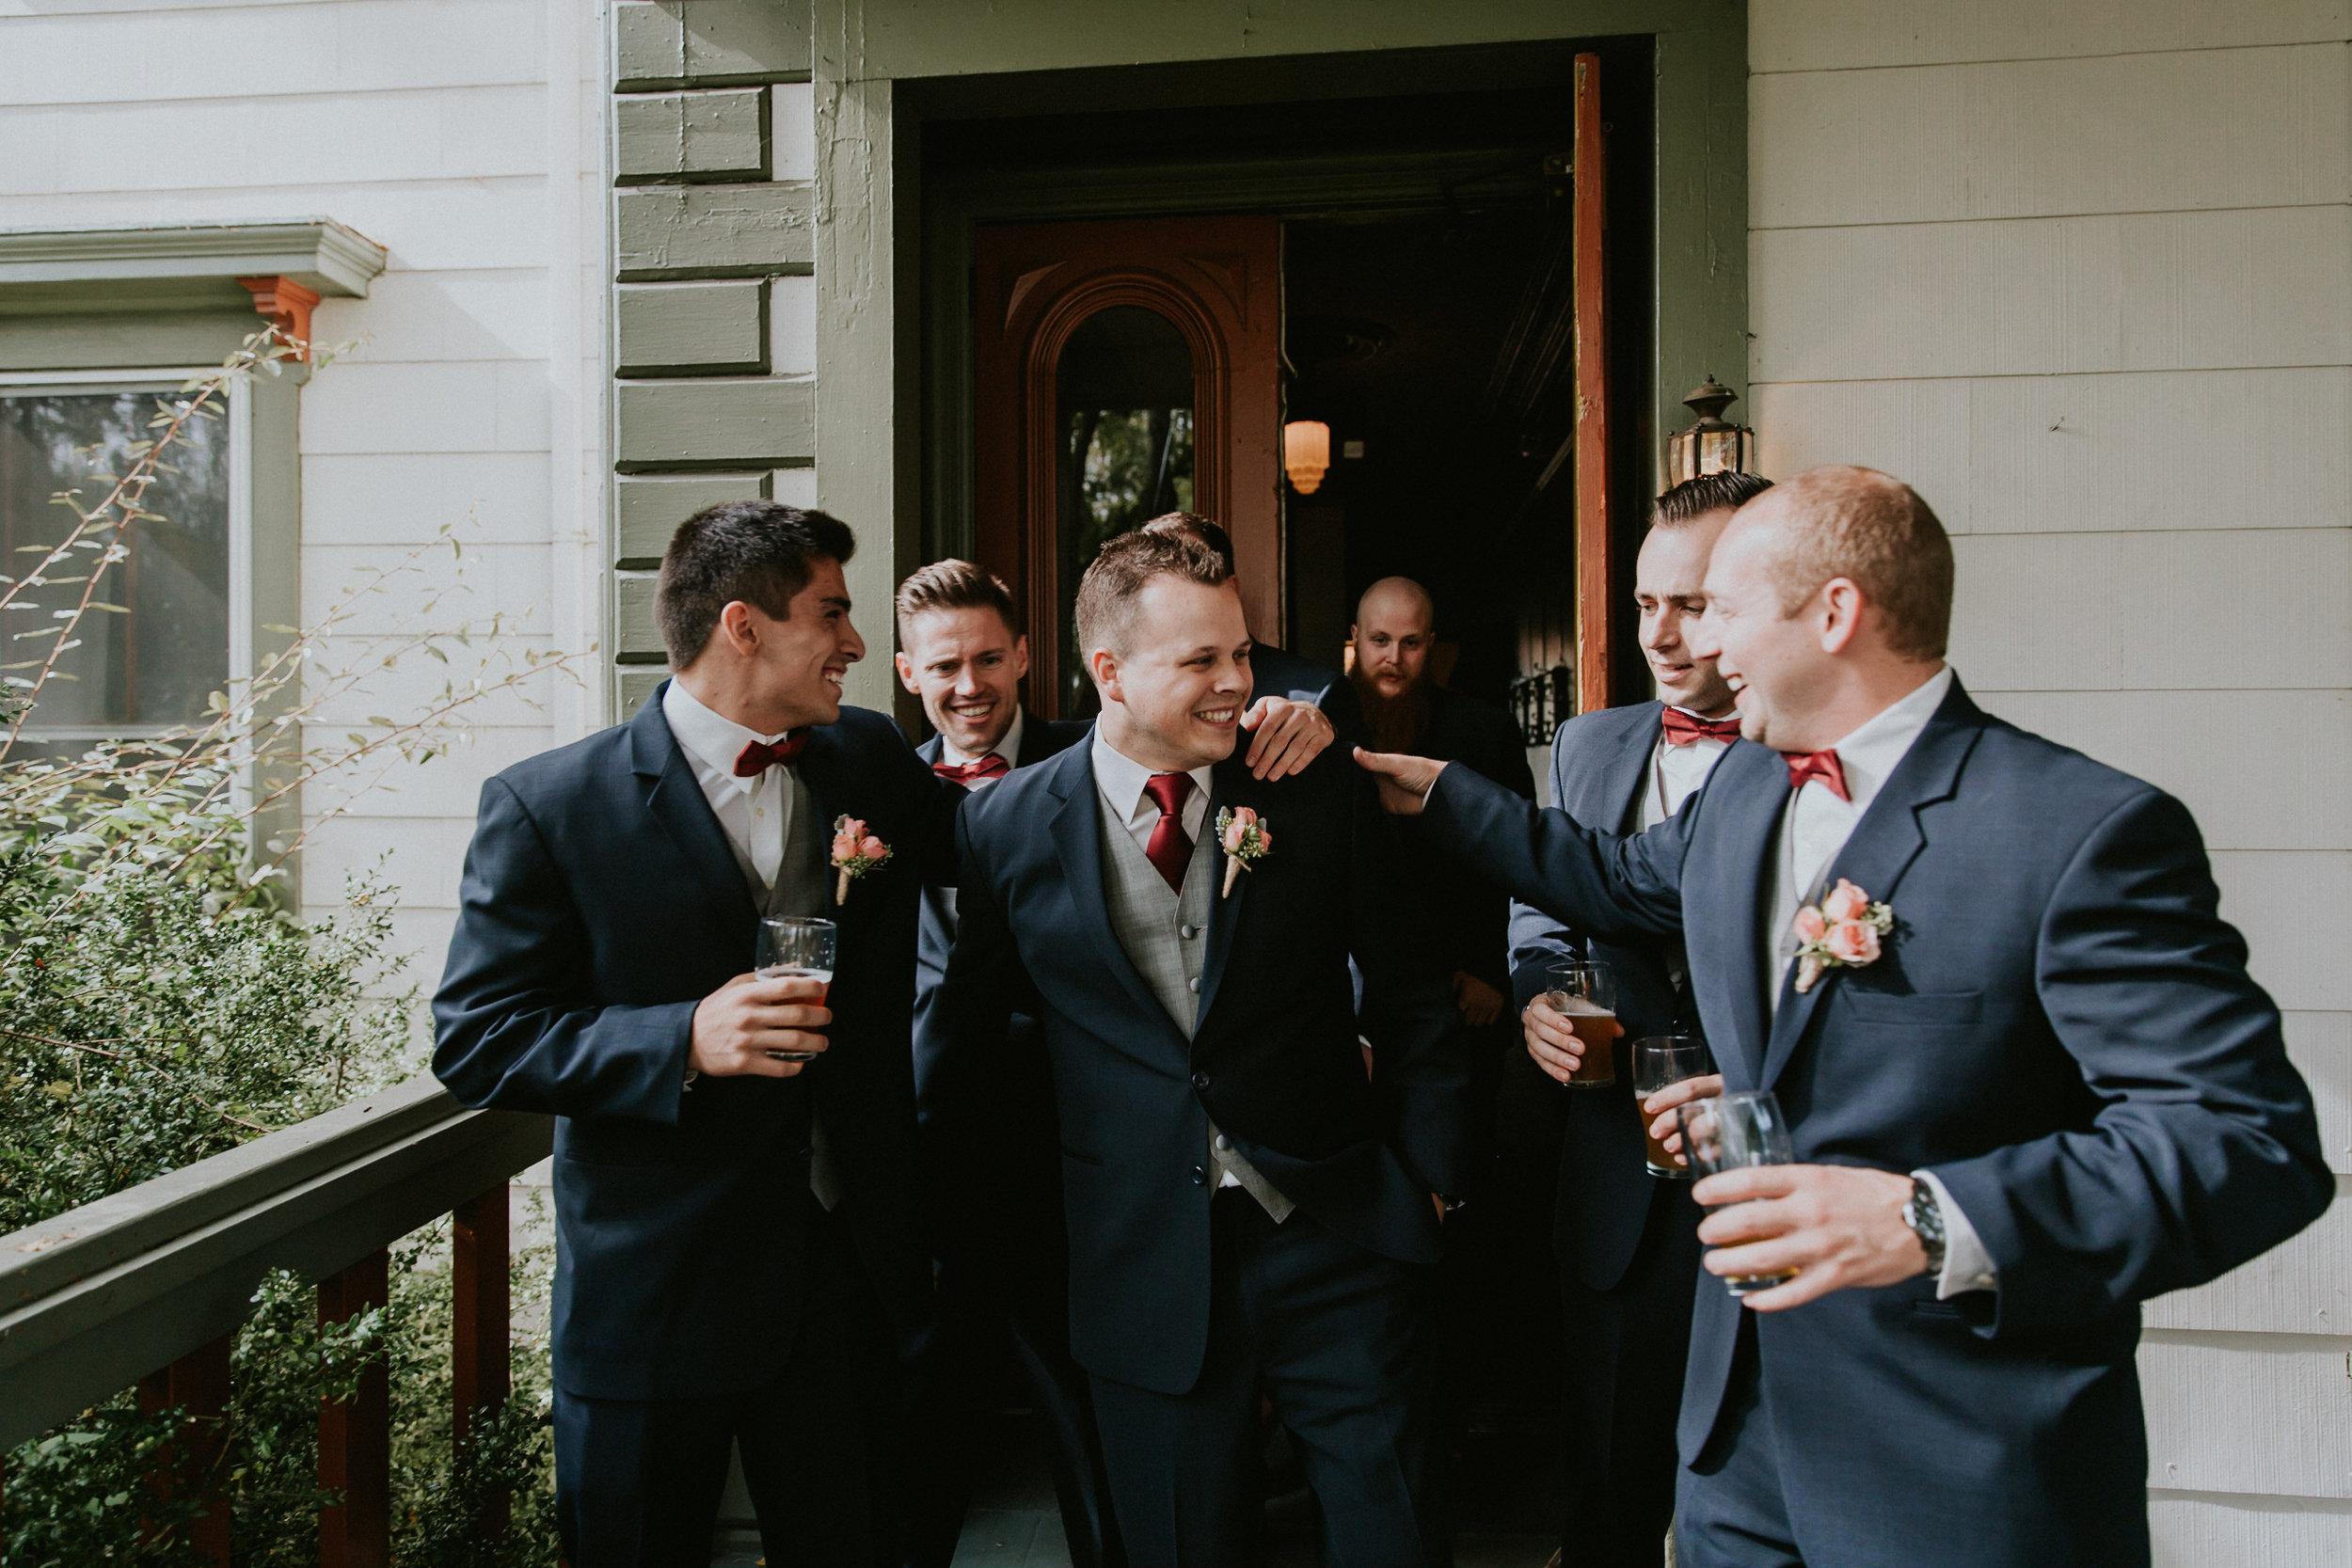 Portland_wedding_photographer_McMenamins_Alfred_Tang-15.jpg